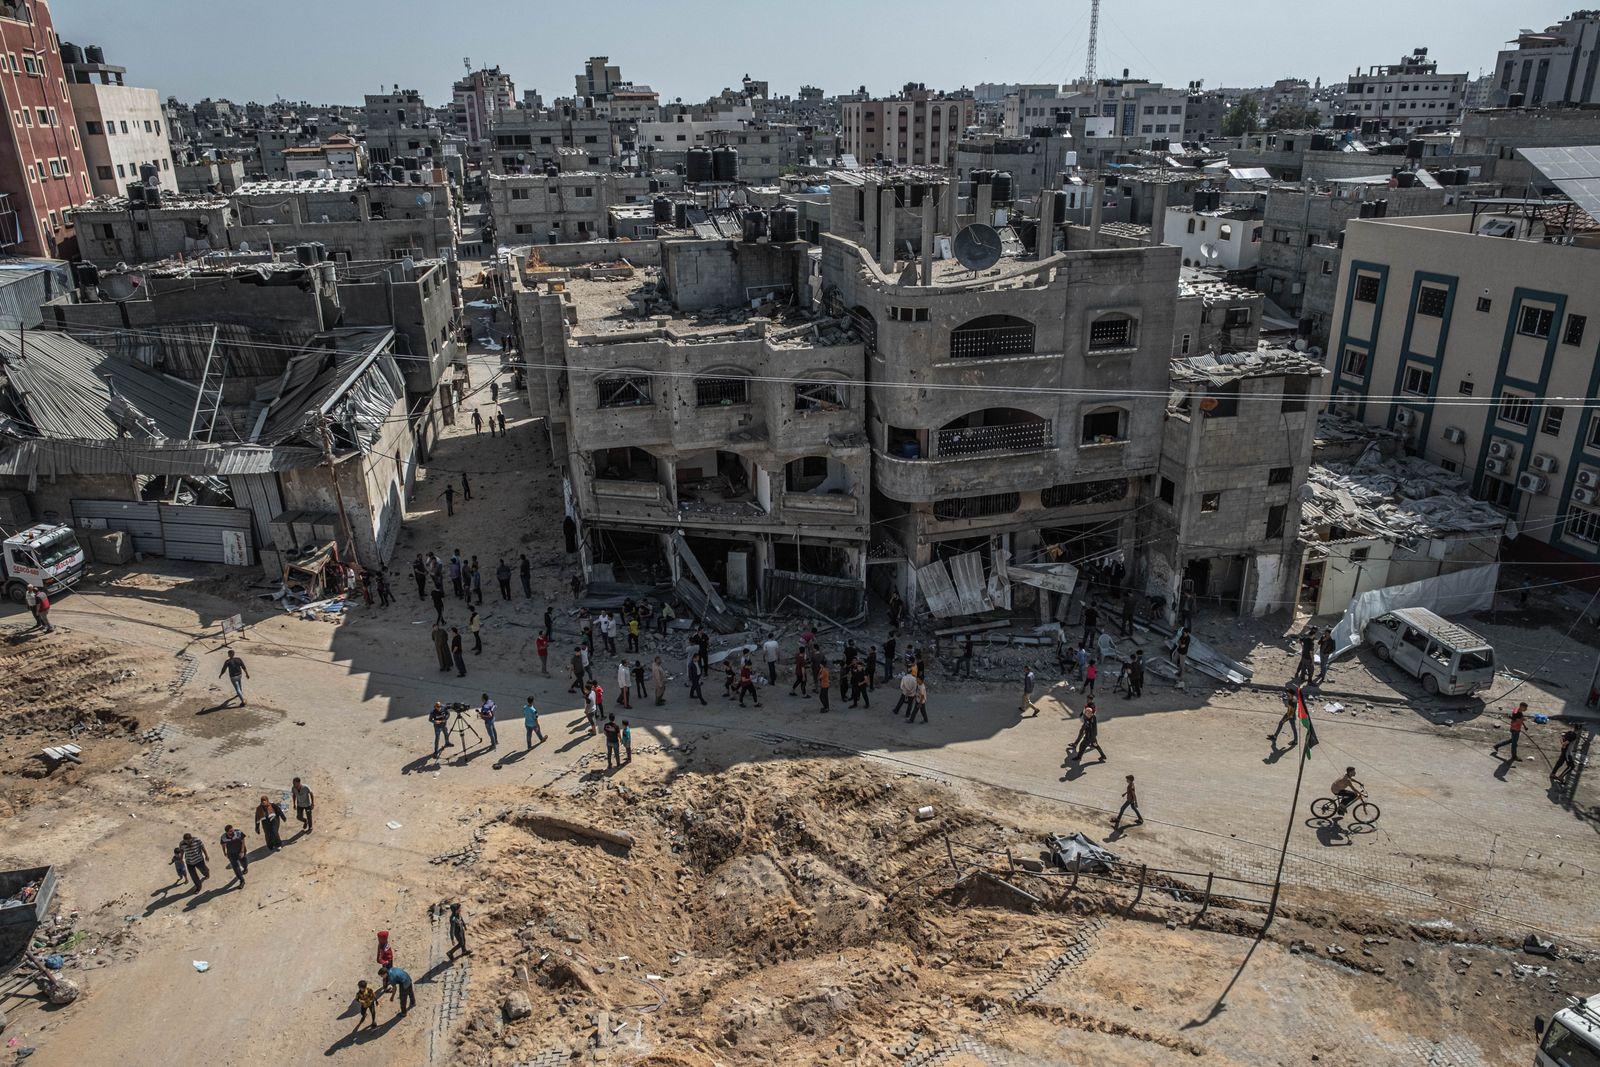 *** BESTPIX *** Civilian Casualties Rise As Israel-Gaza Violence Continues